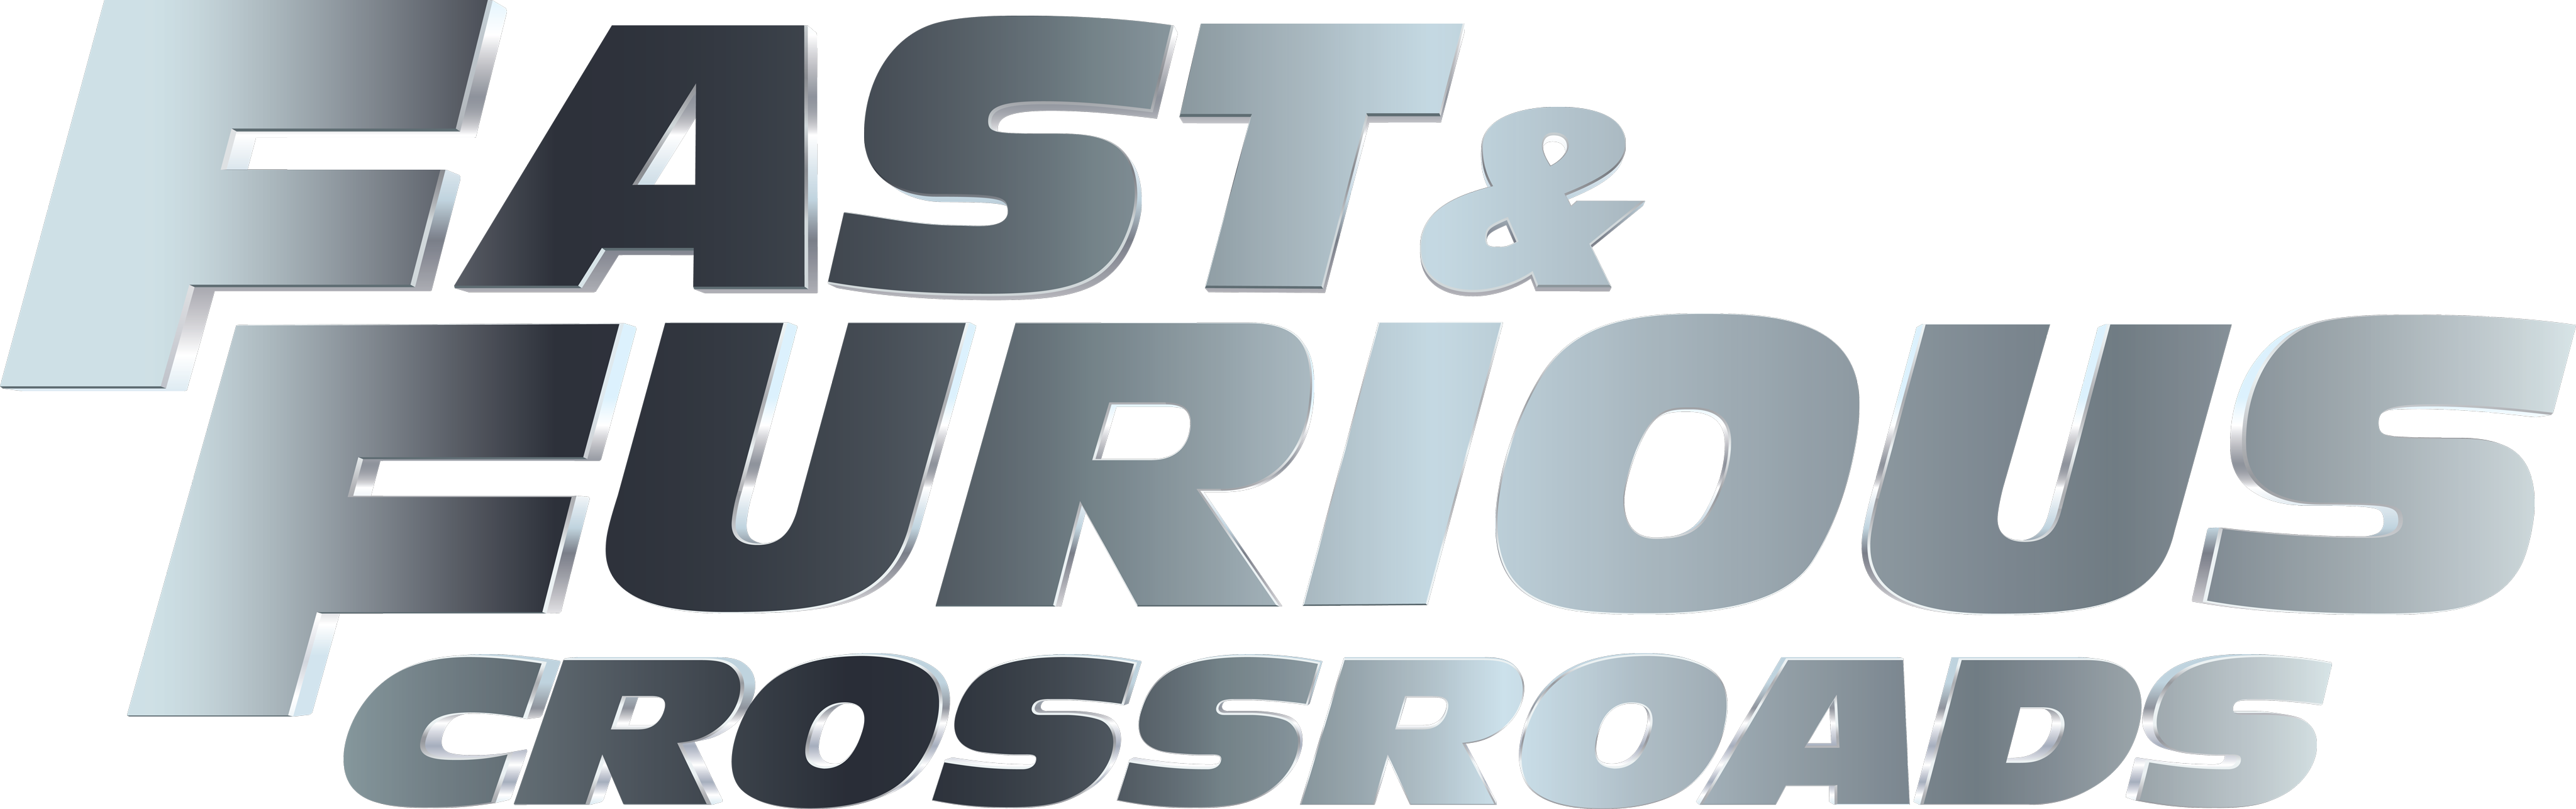 Fast & Furious Crossroads logo